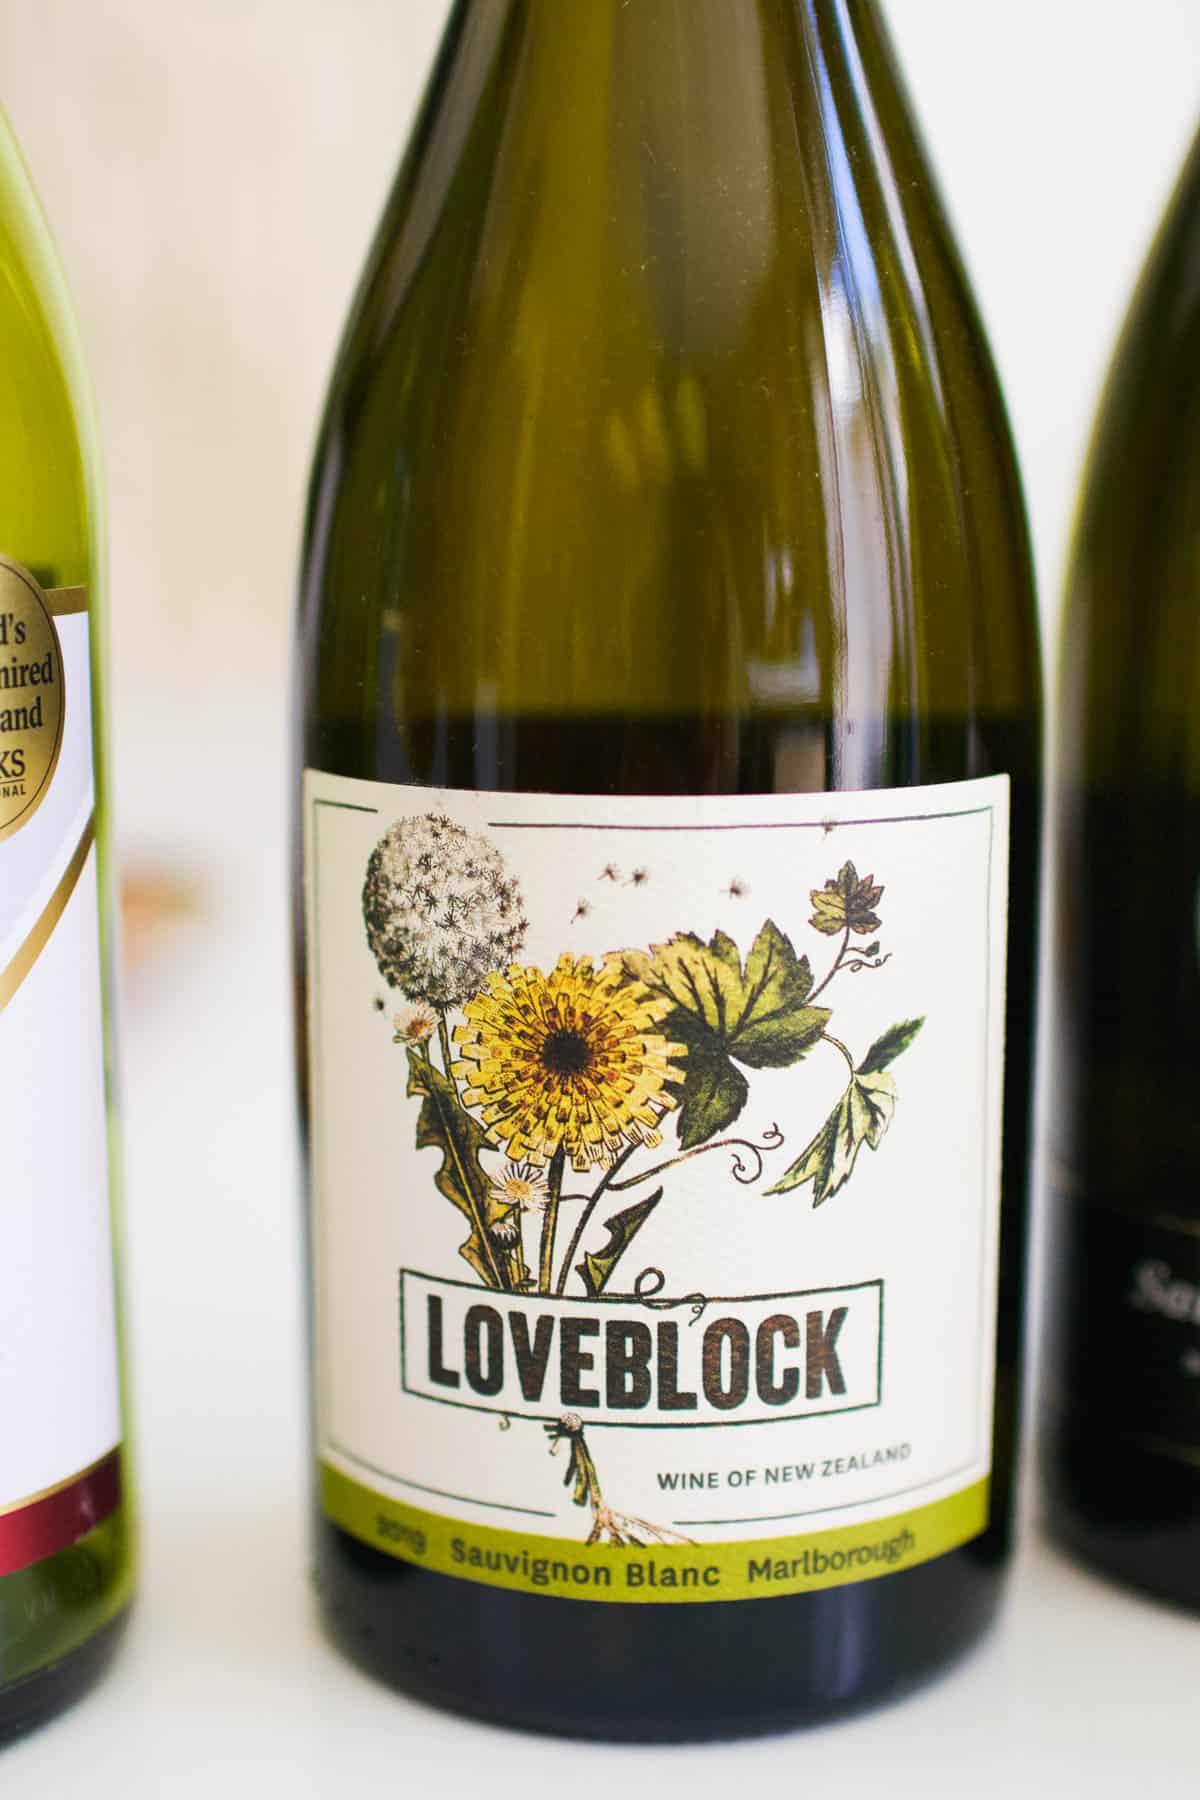 Close up of a Loveblock Sauvignon Blanc bottle.